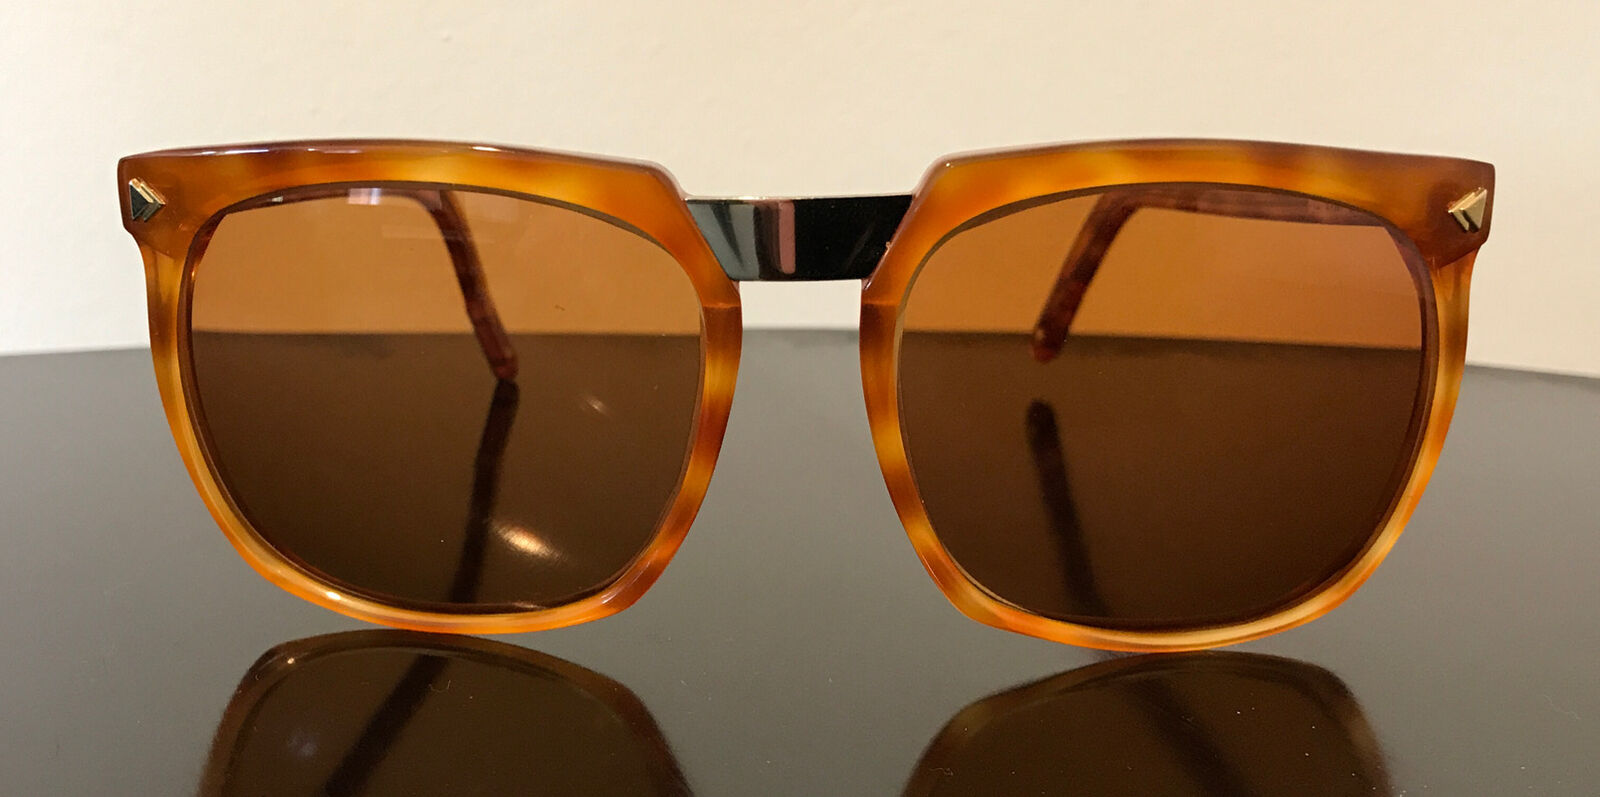 Authentic Vintage Valentino Sunglasses 145 57-20 Tortoise Shell-Style